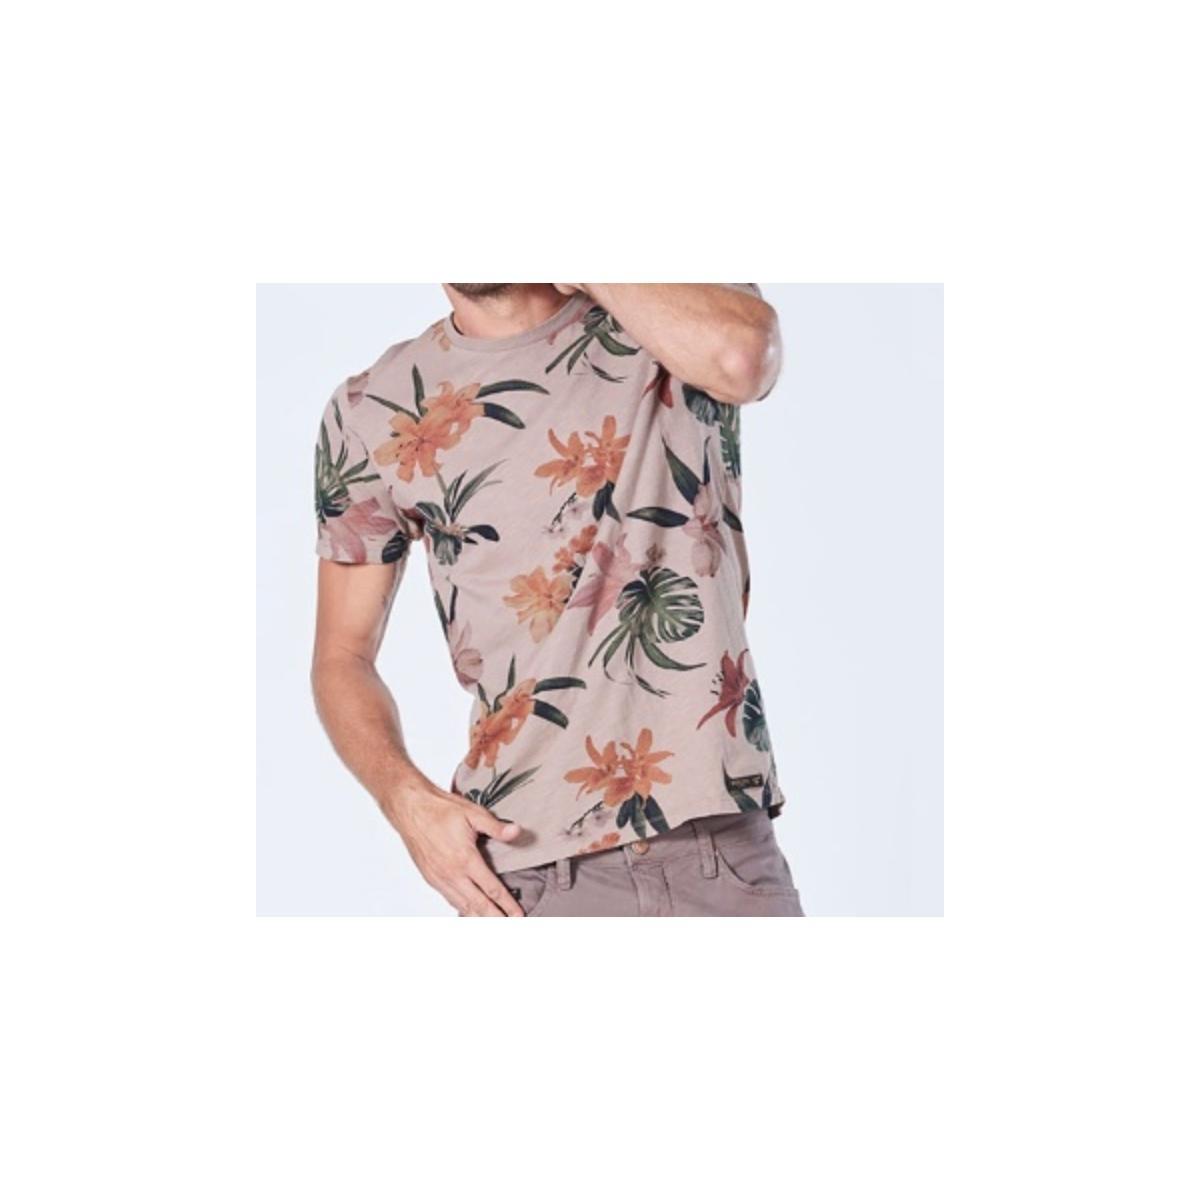 Camiseta Masculina Colcci 350108250 44085 Rosa Floral